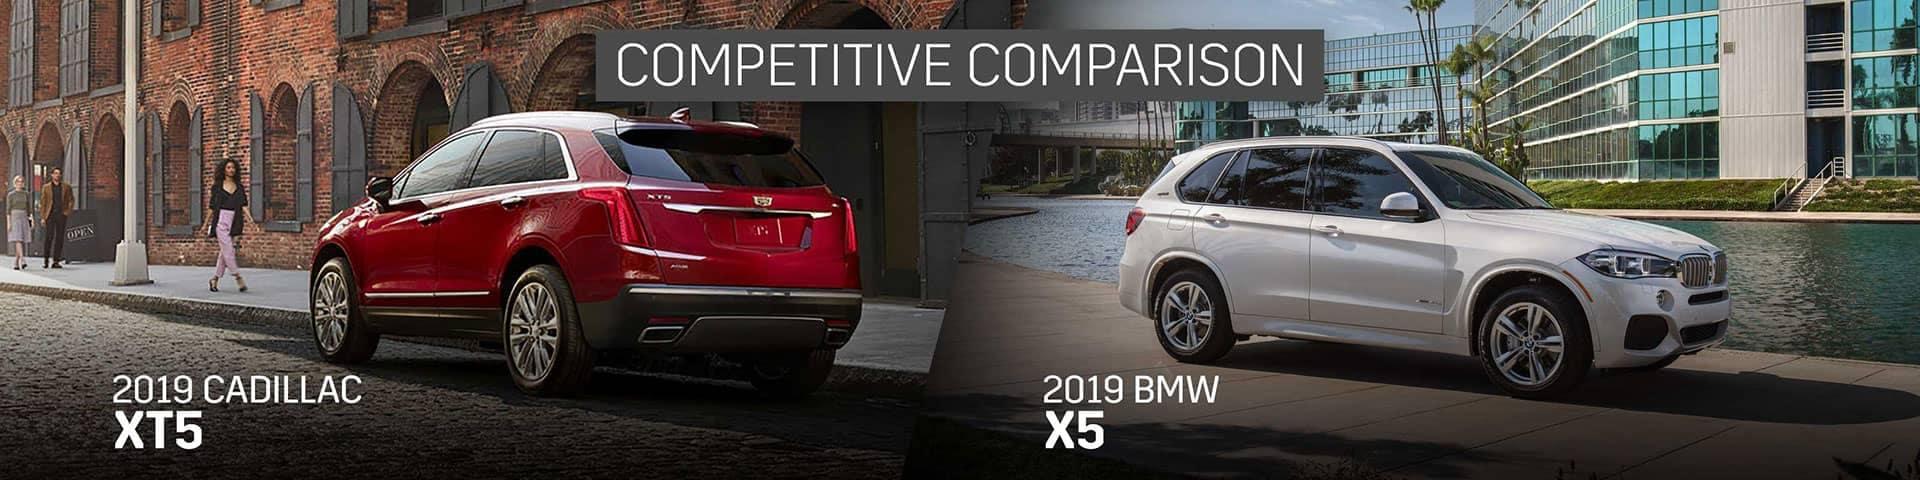 11-compare-2019-cadillac-xt5